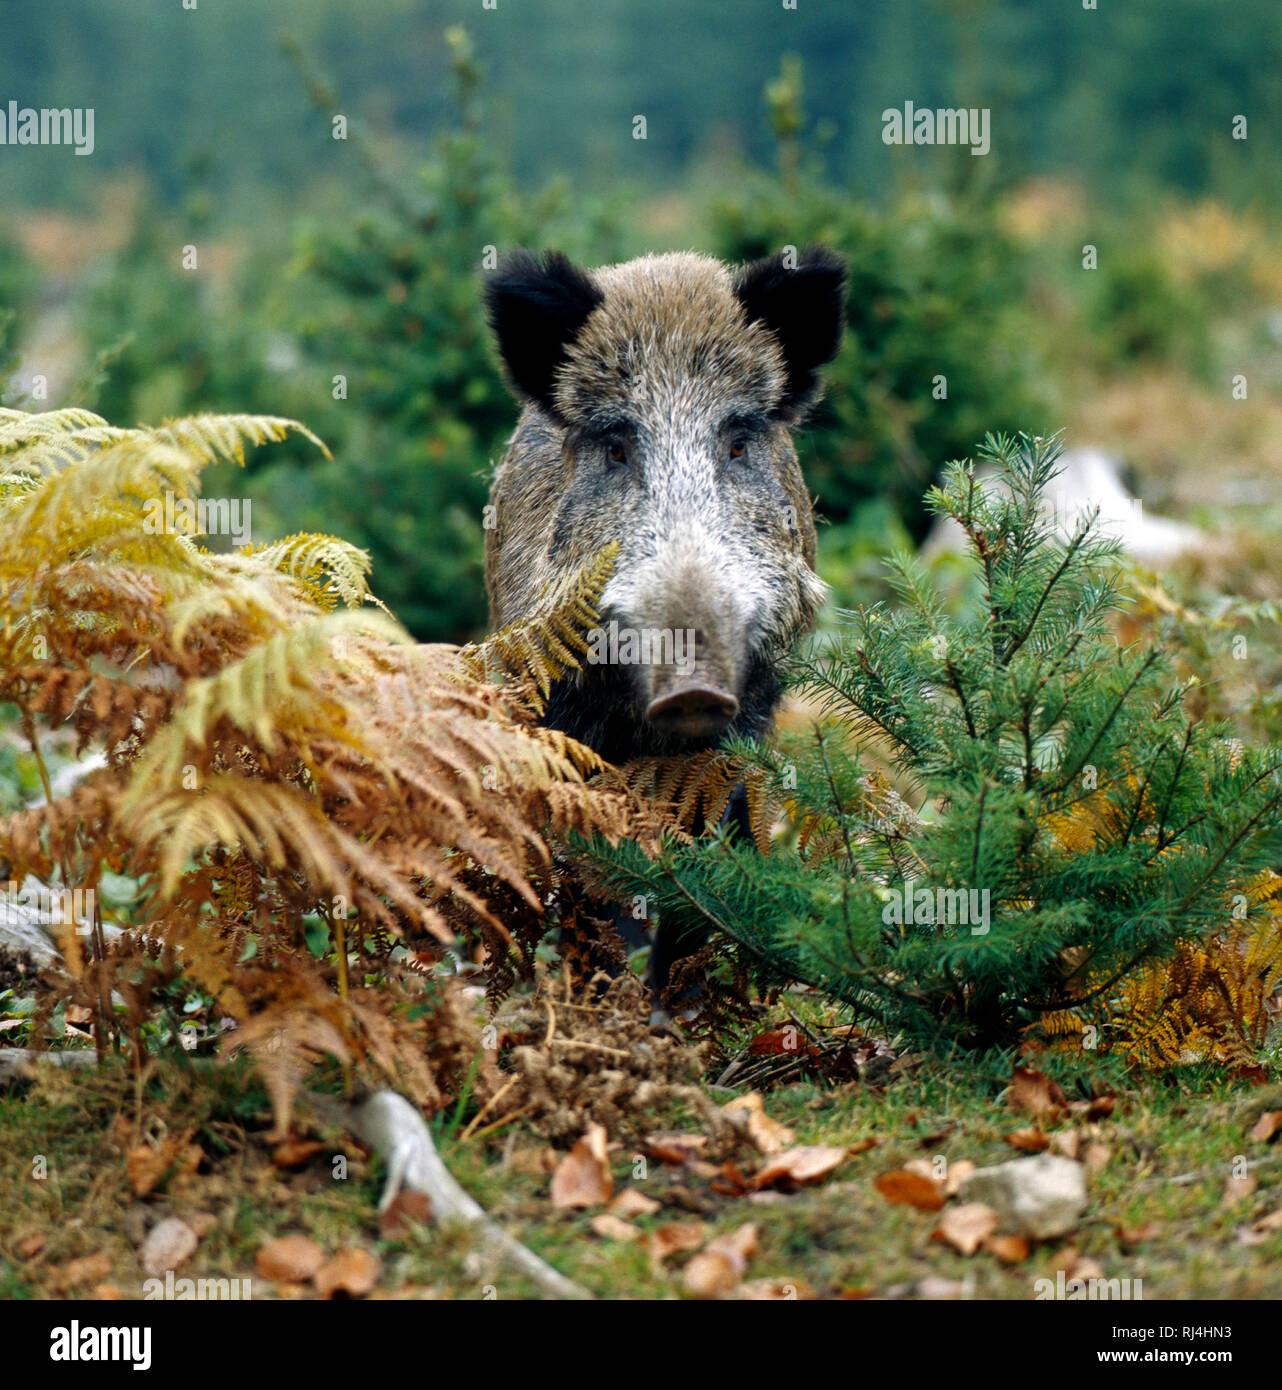 Wildschwein im Unterholz hinter vertrockneten Farnwedeln - Stock Image